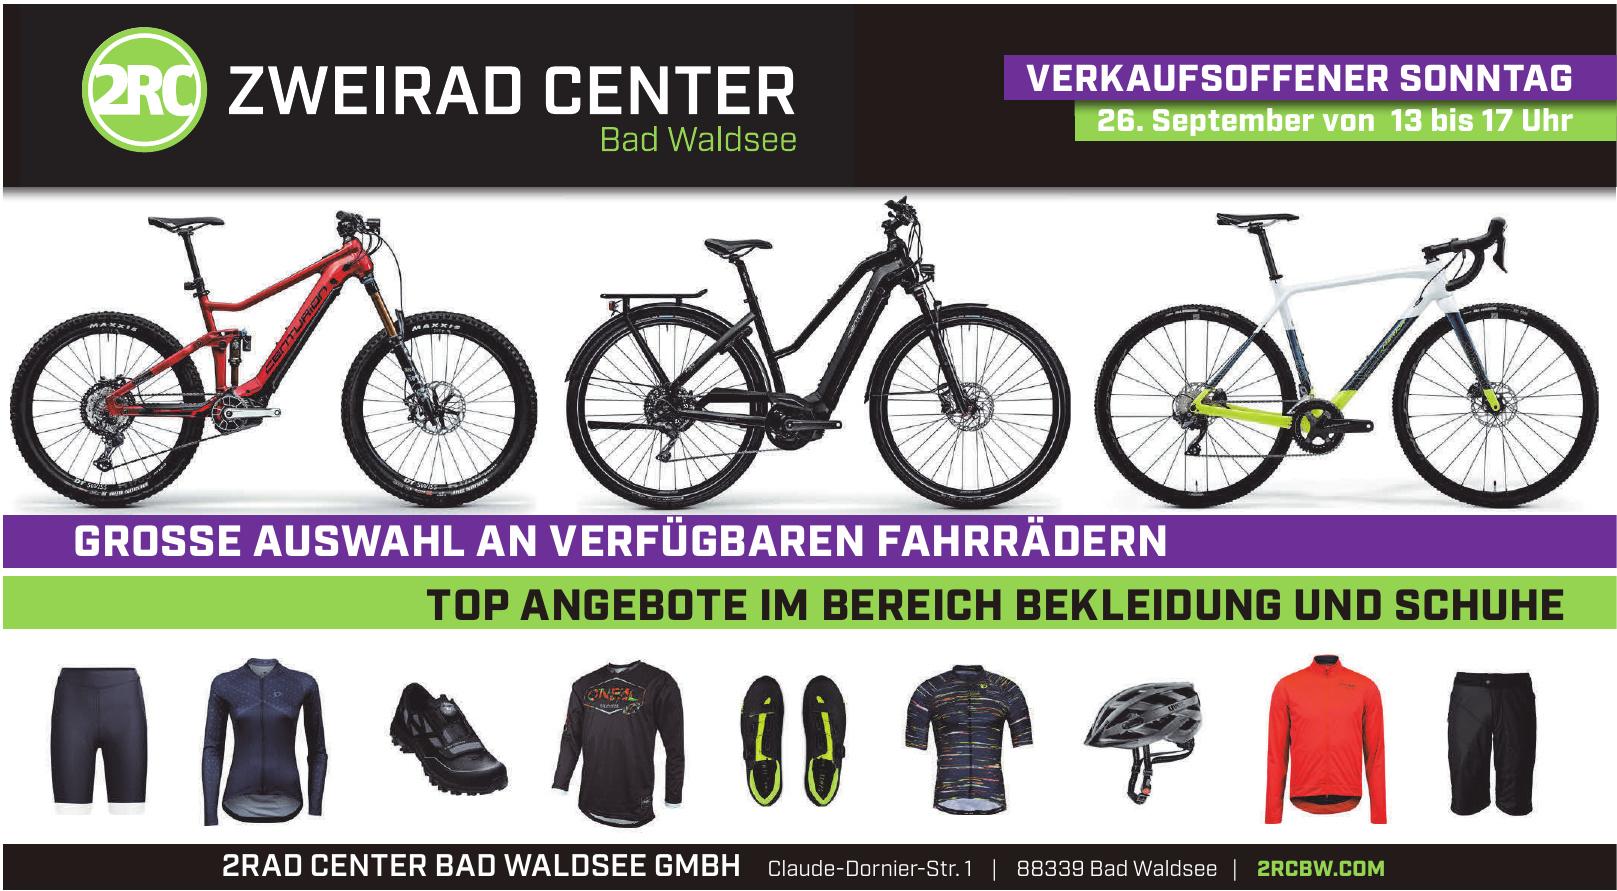 2Rad Center Bad Waldsee GmbH